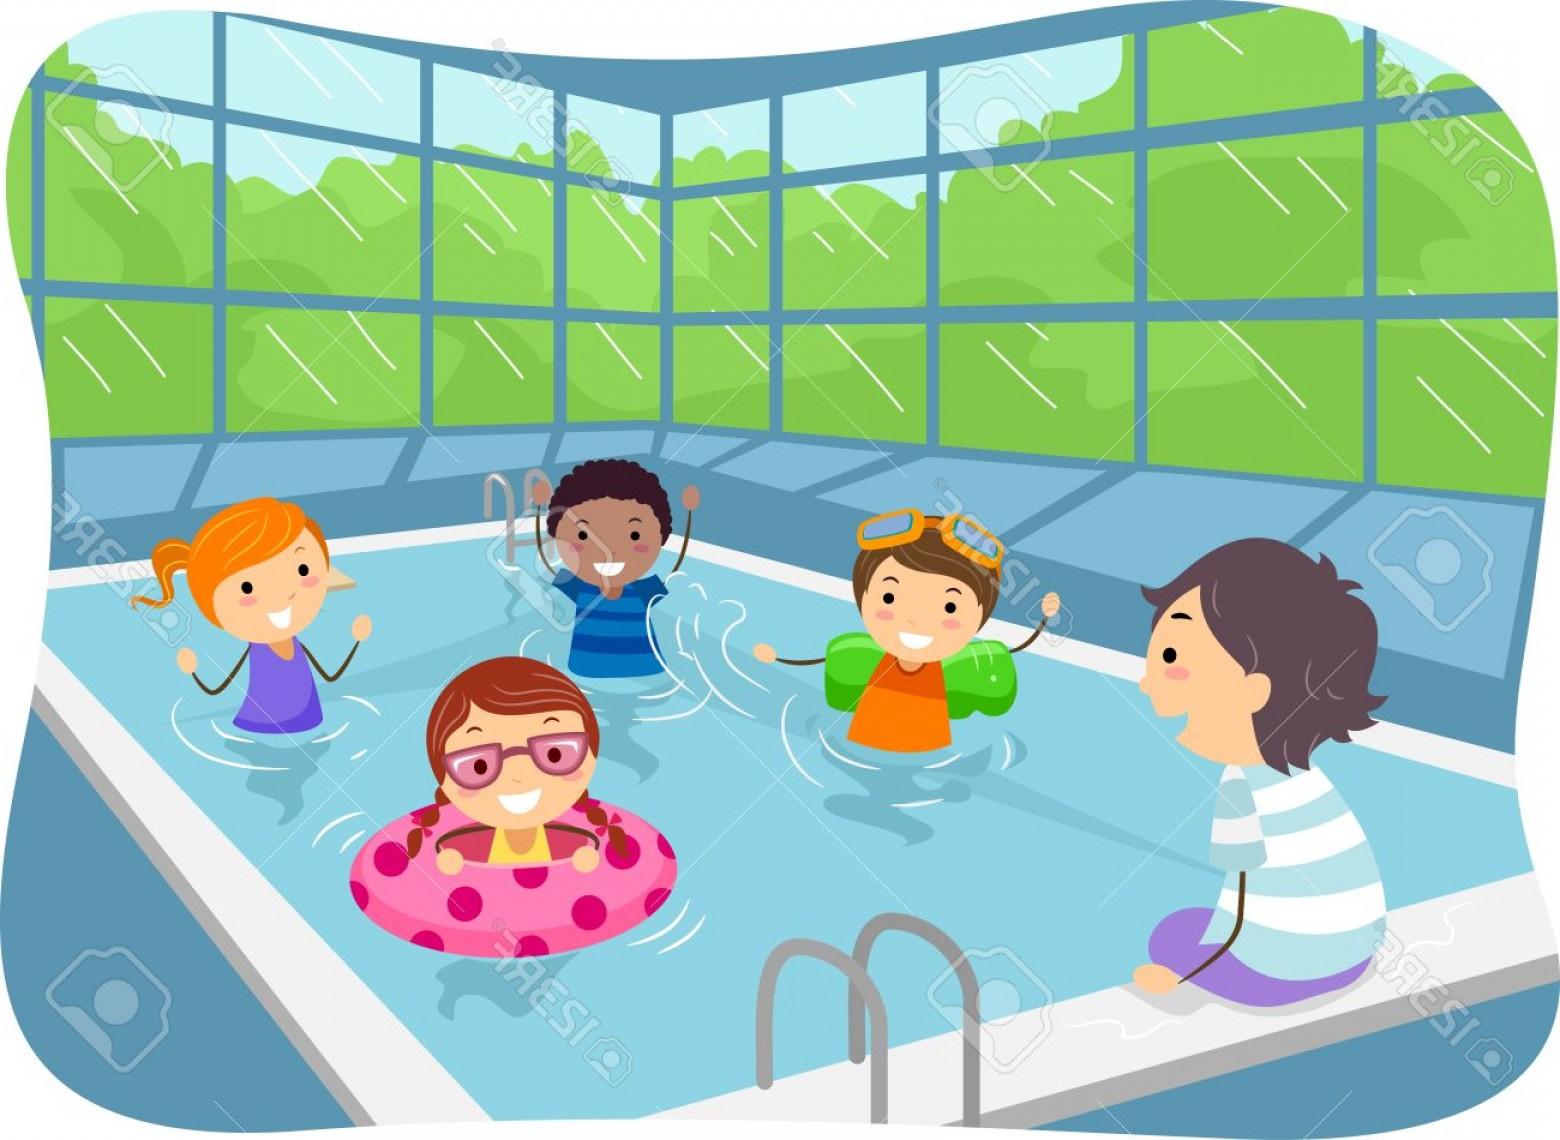 Photostock Vector Illustration Of Kids Swimming In An Indoor.